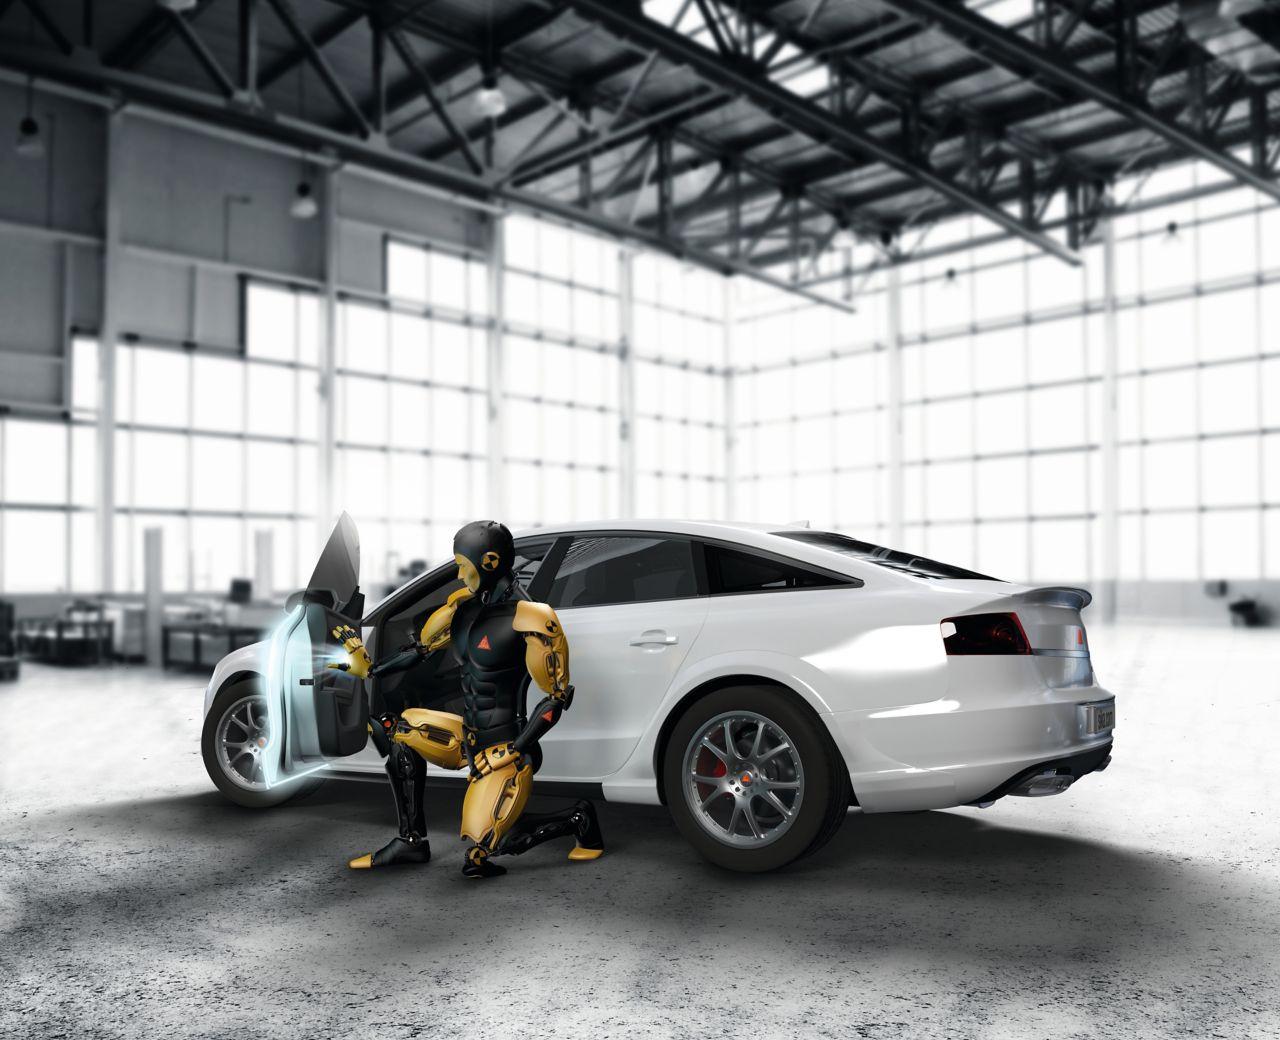 Car crash dummy highlighting sealing applications on a car